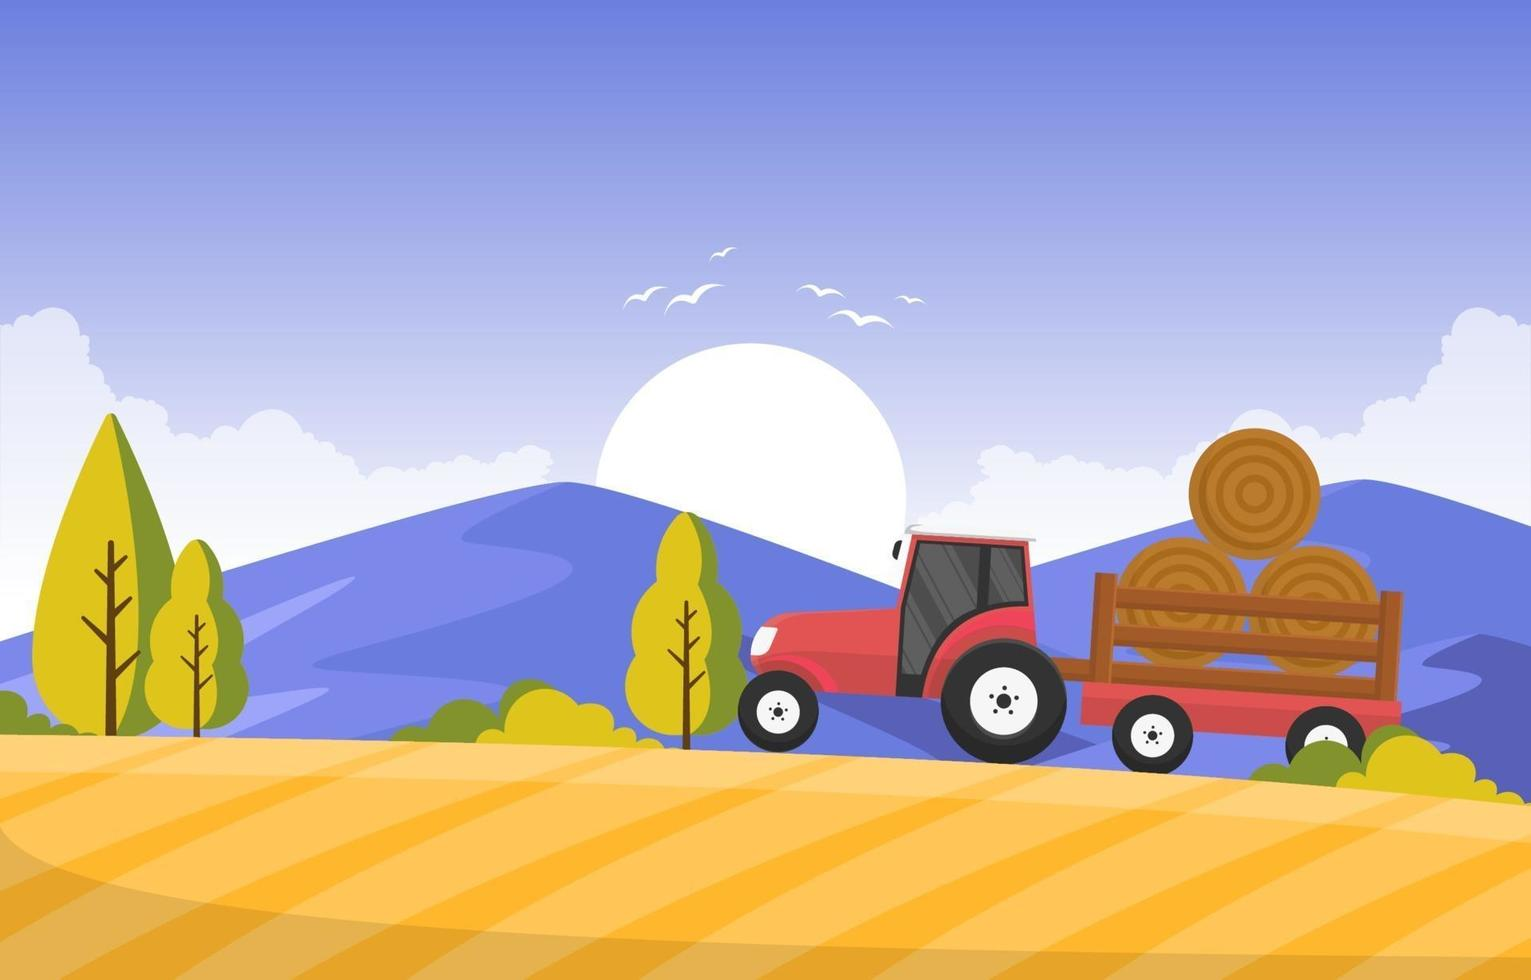 Agriculture Wheat Field Farm Rural Nature Scene Landscape Illustration vector